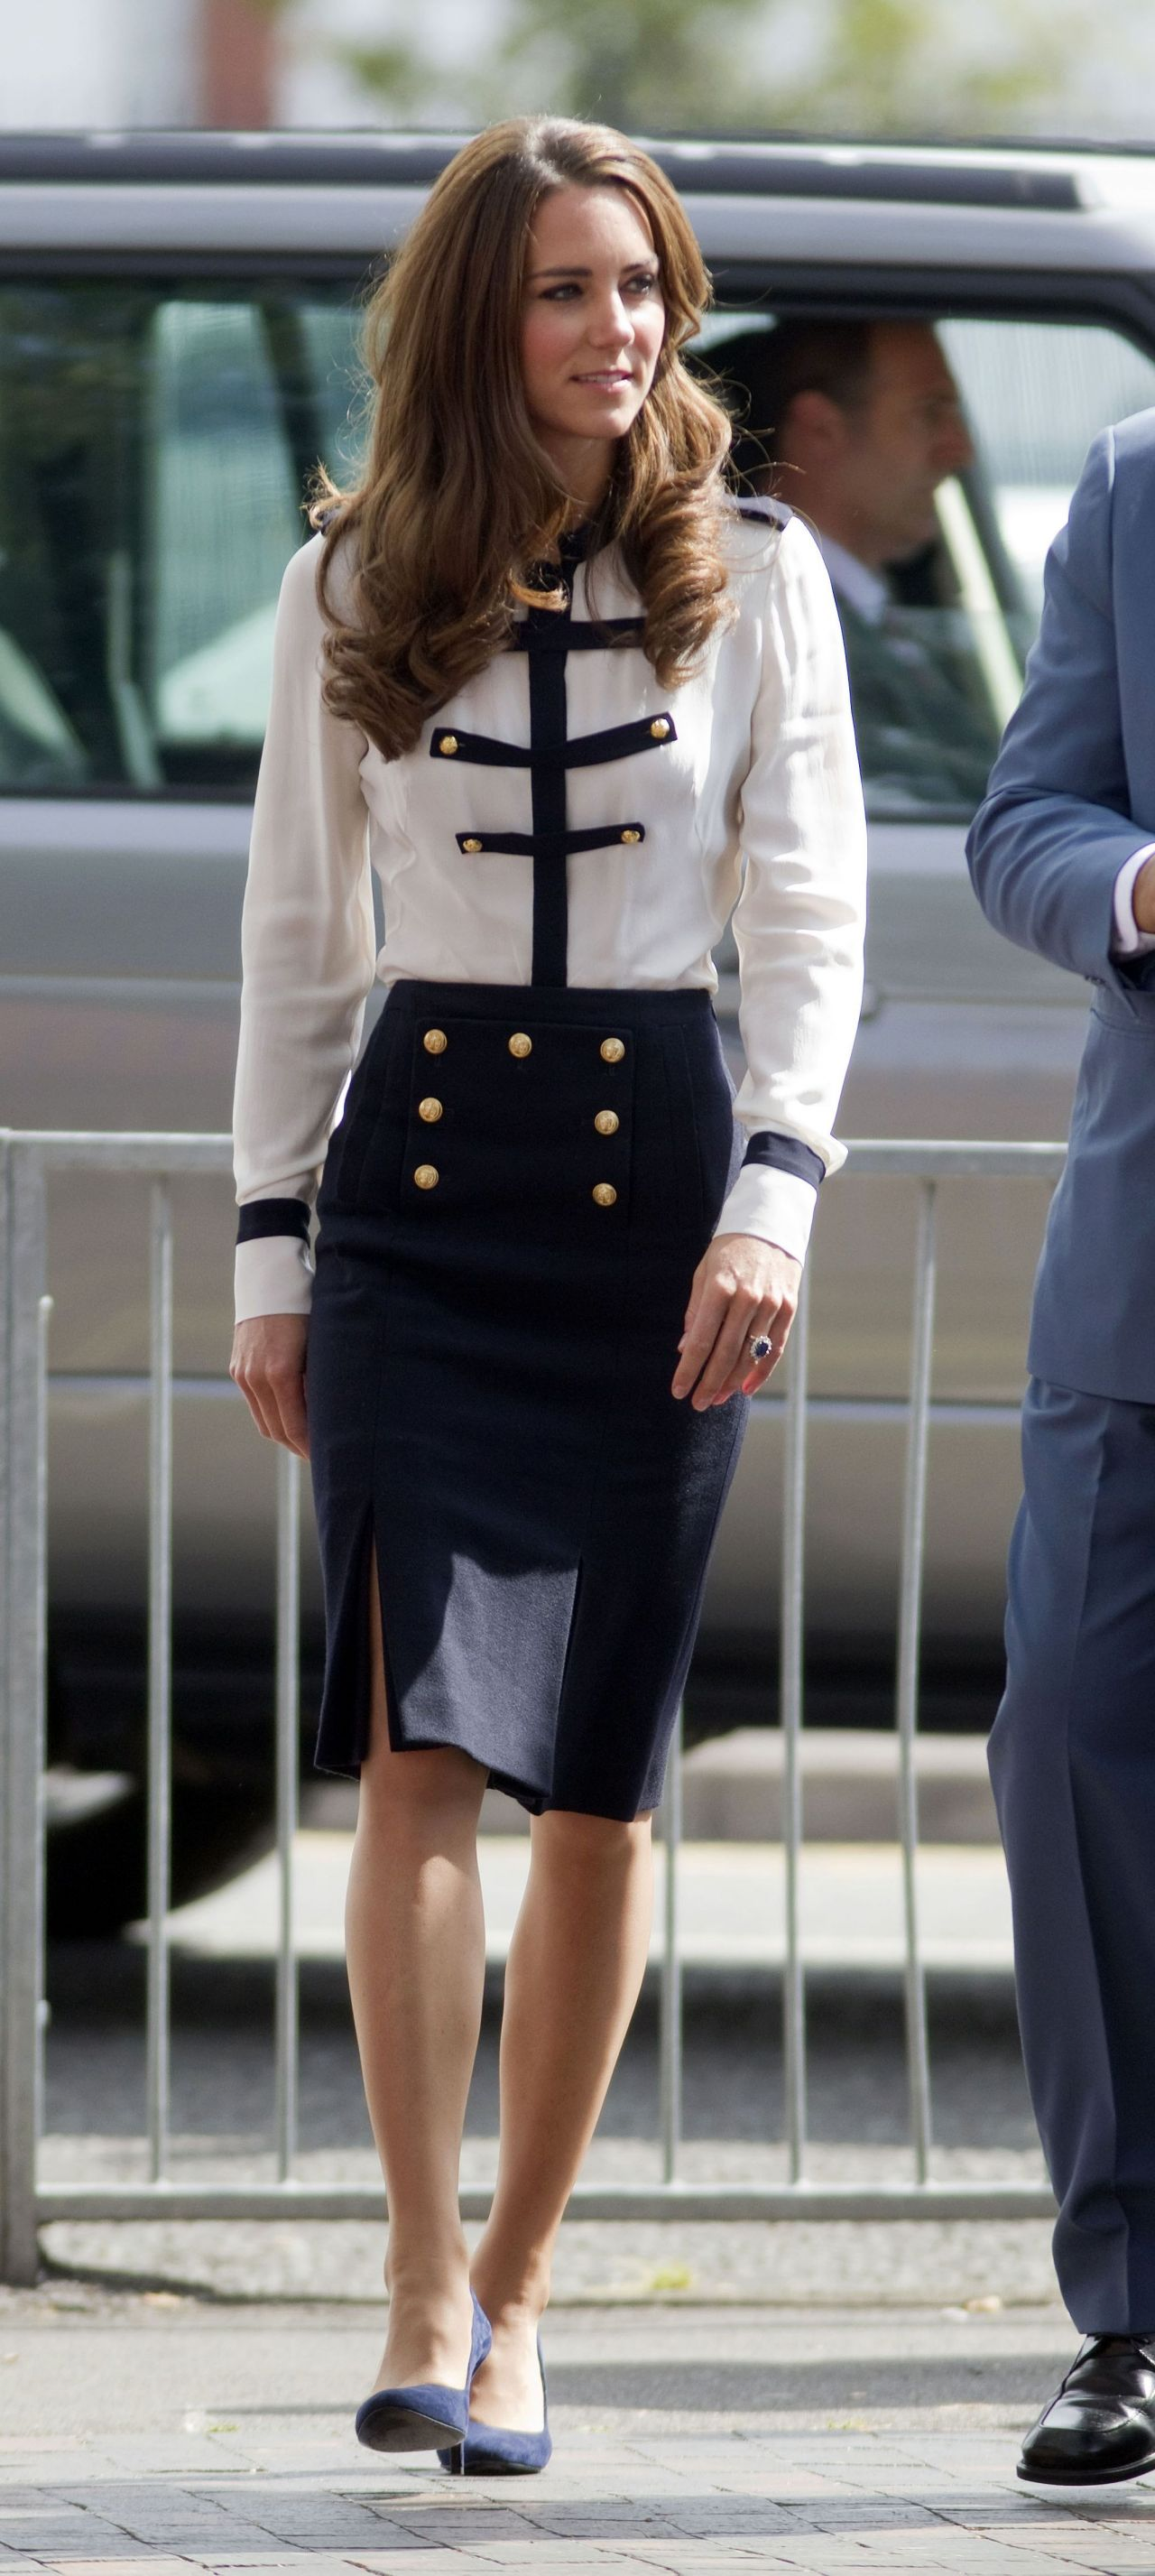 Kate Middleton Wearing Alexander Mcqueen Official Visit